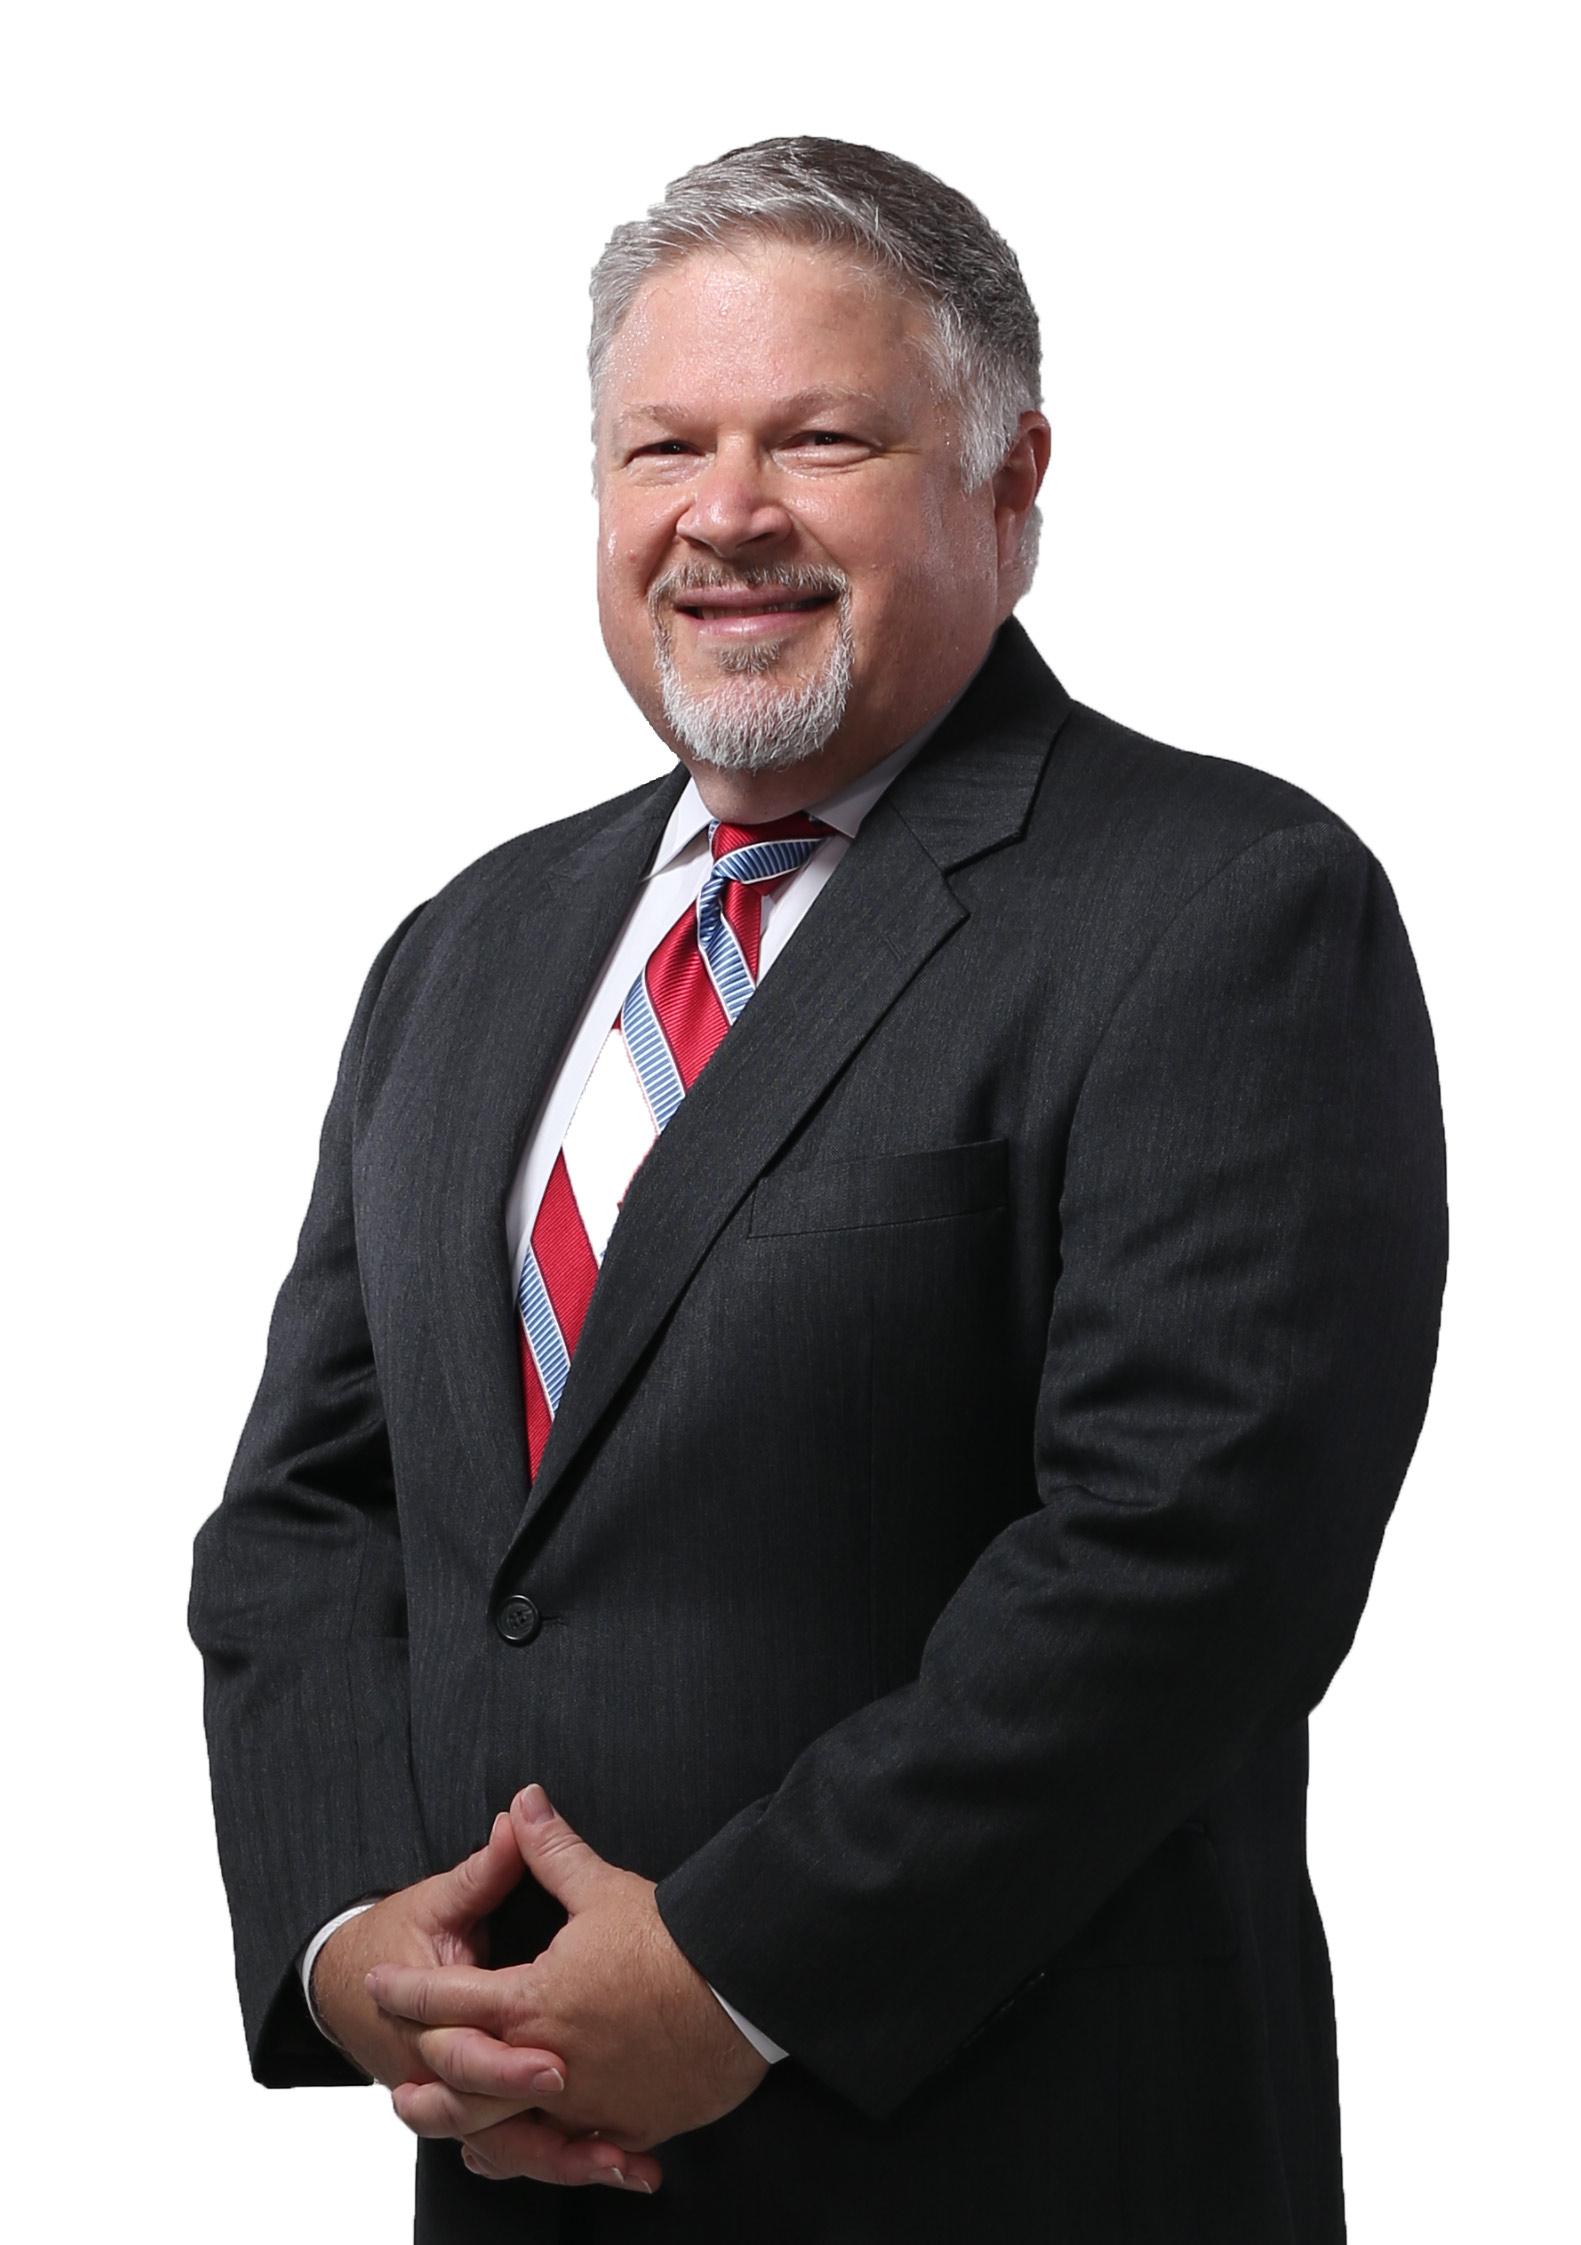 Kevin Bayzath